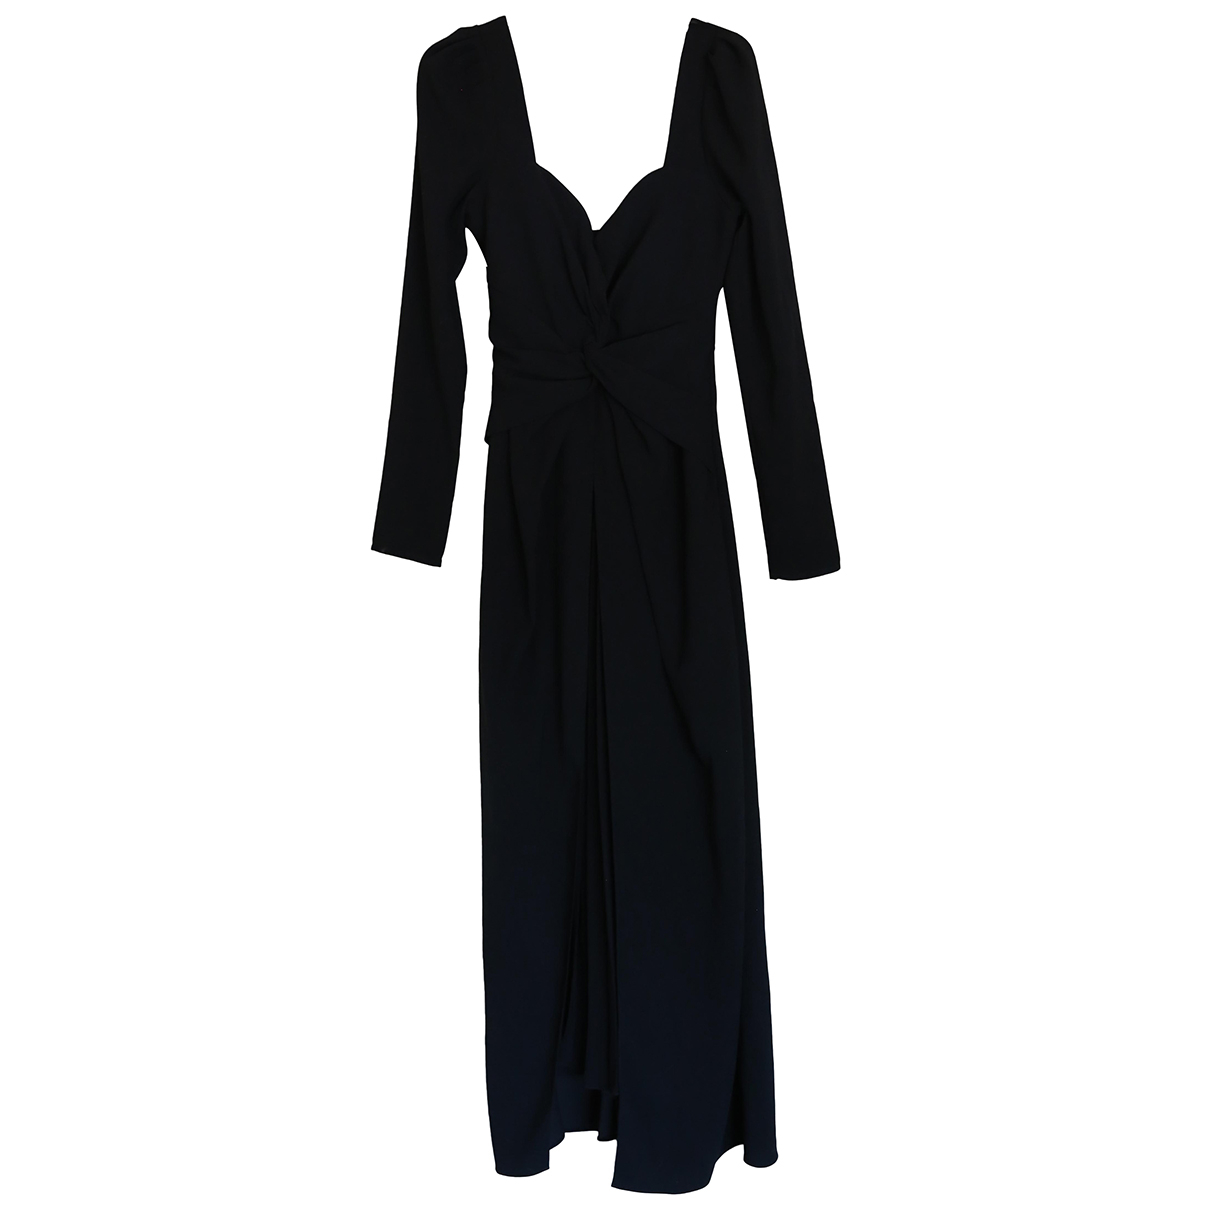 Self Portrait \N Black dress for Women 8 UK